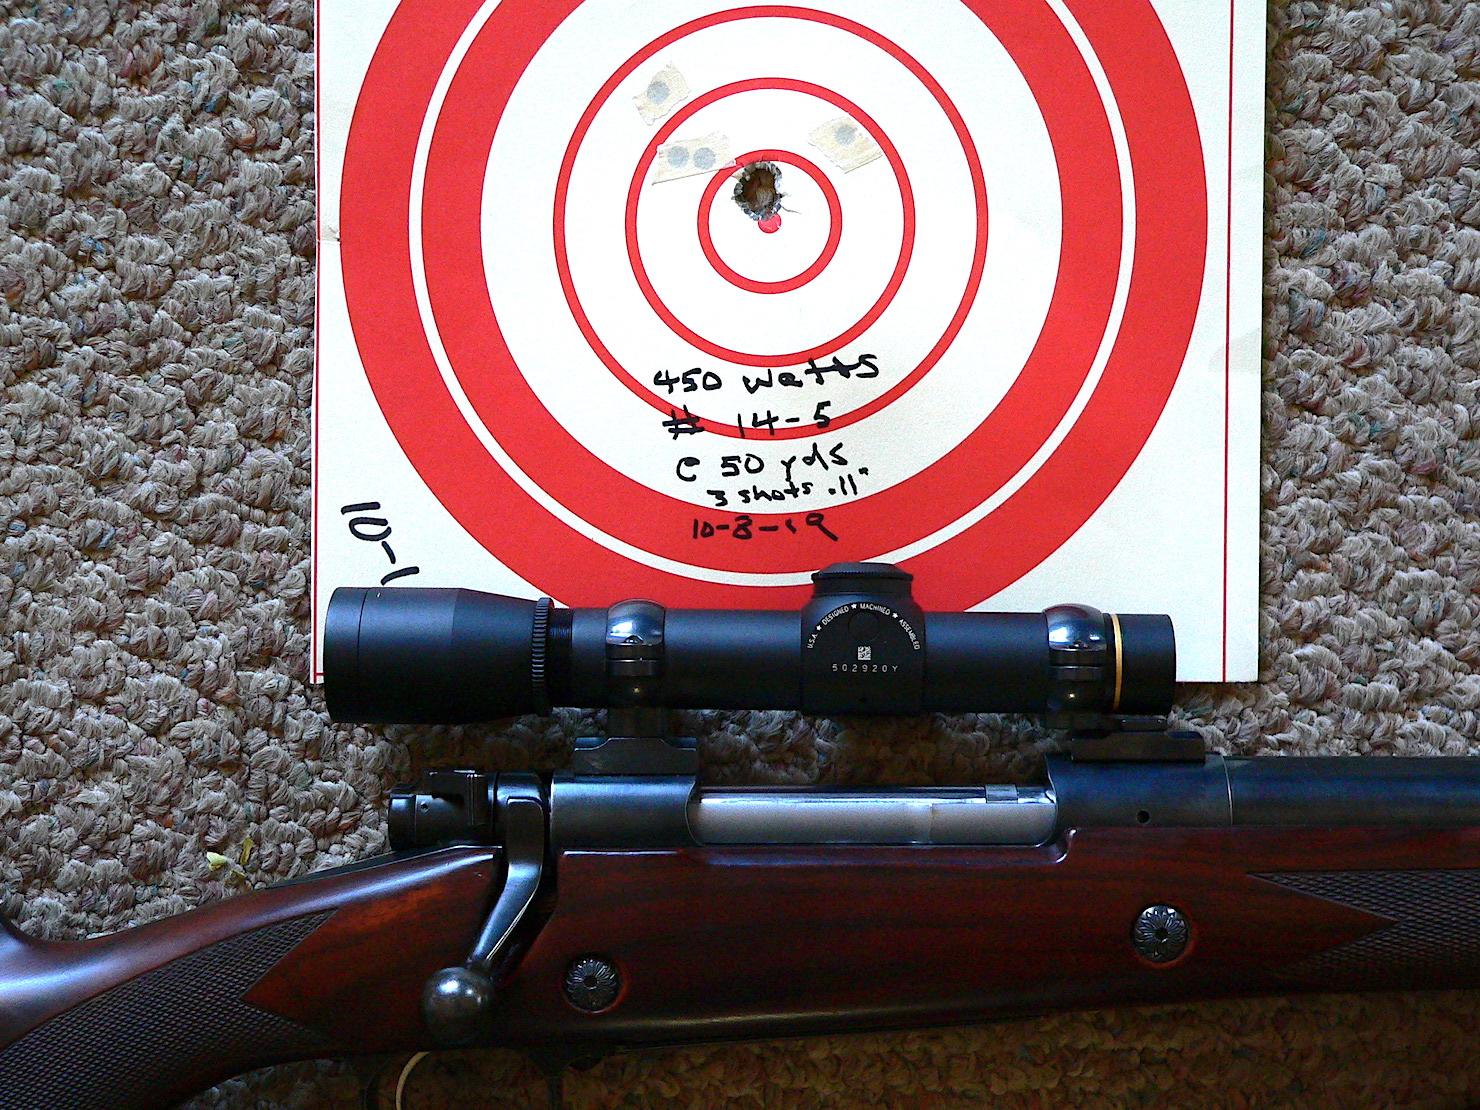 450 Watts target 10-19.JPG